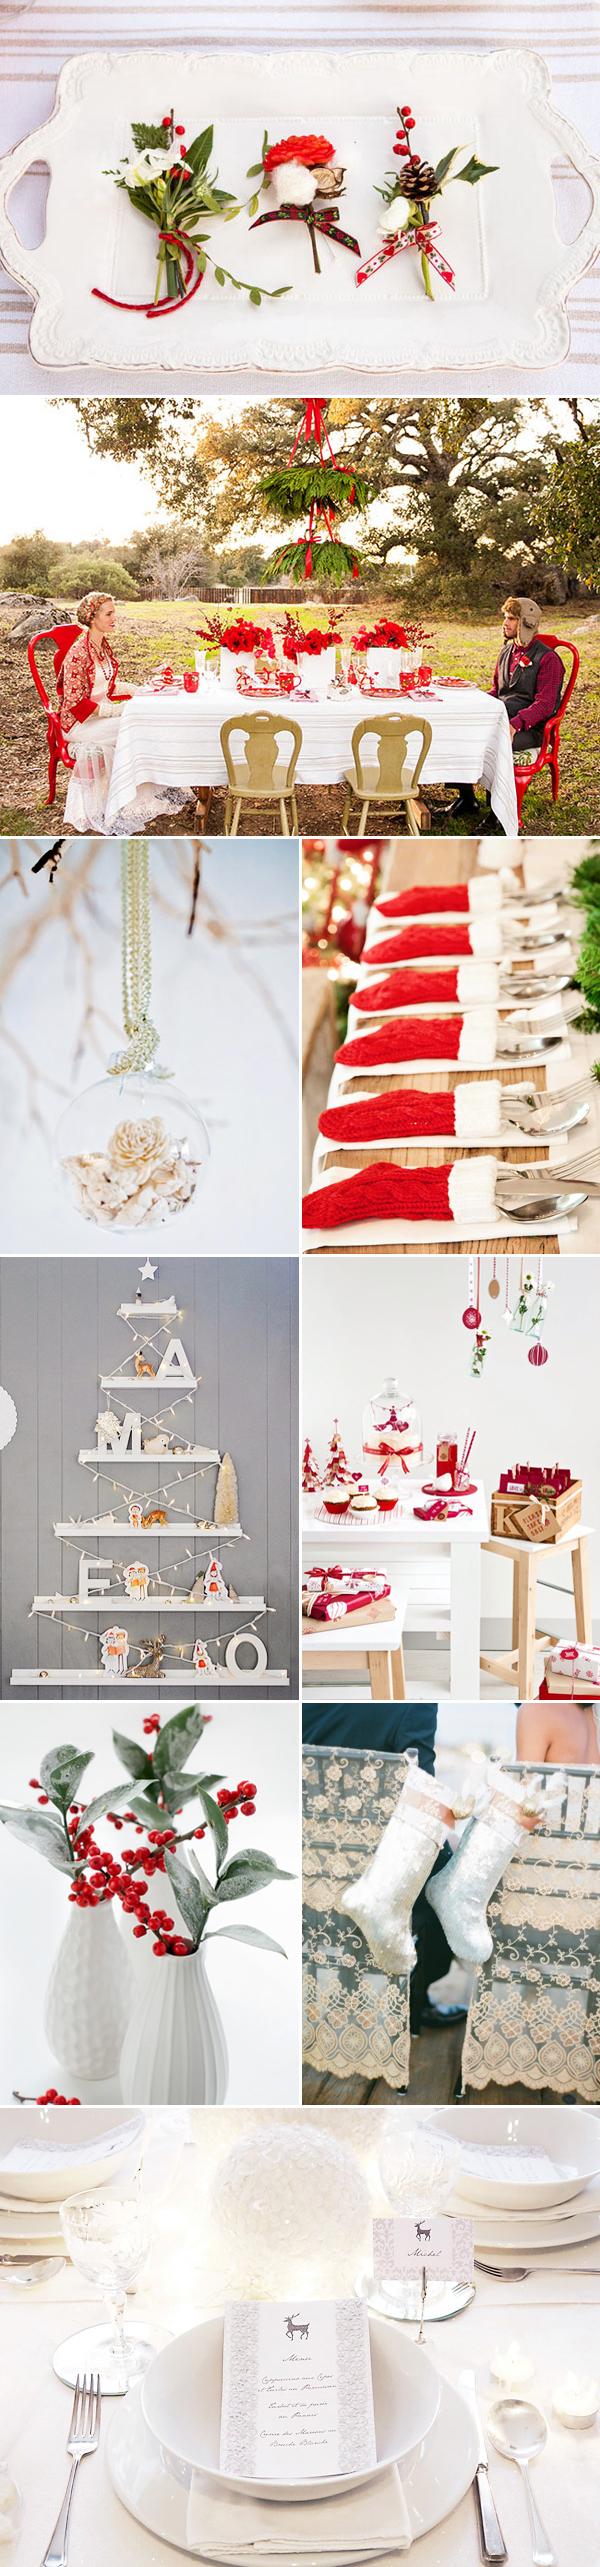 Christmas04-decor